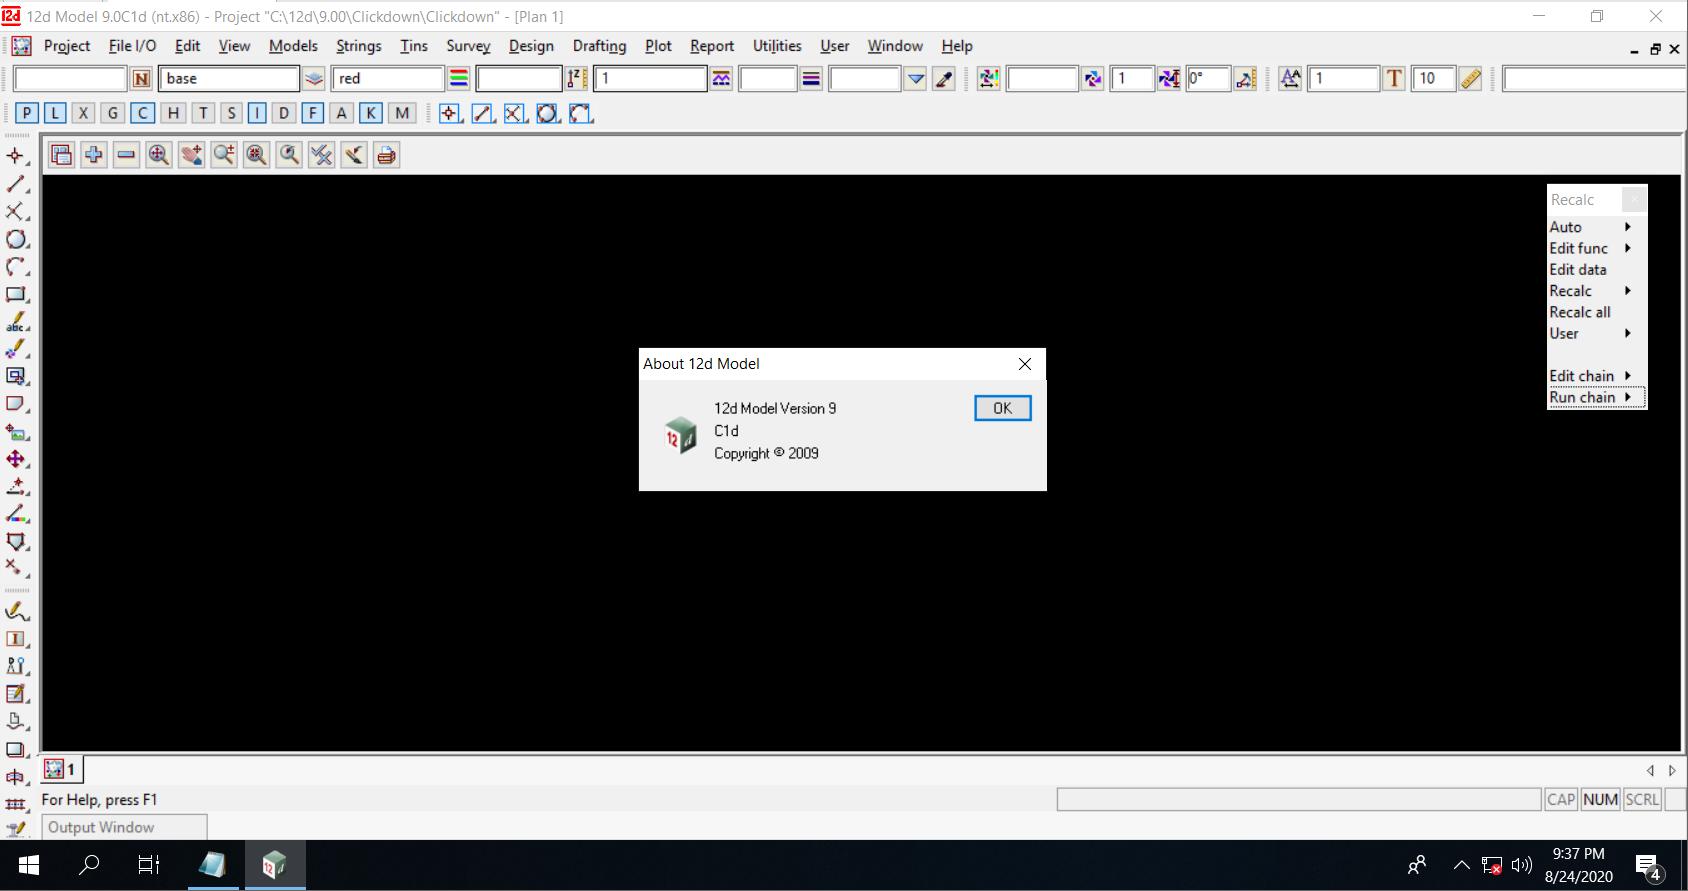 Working with 12d Model v9.0 C1d full license